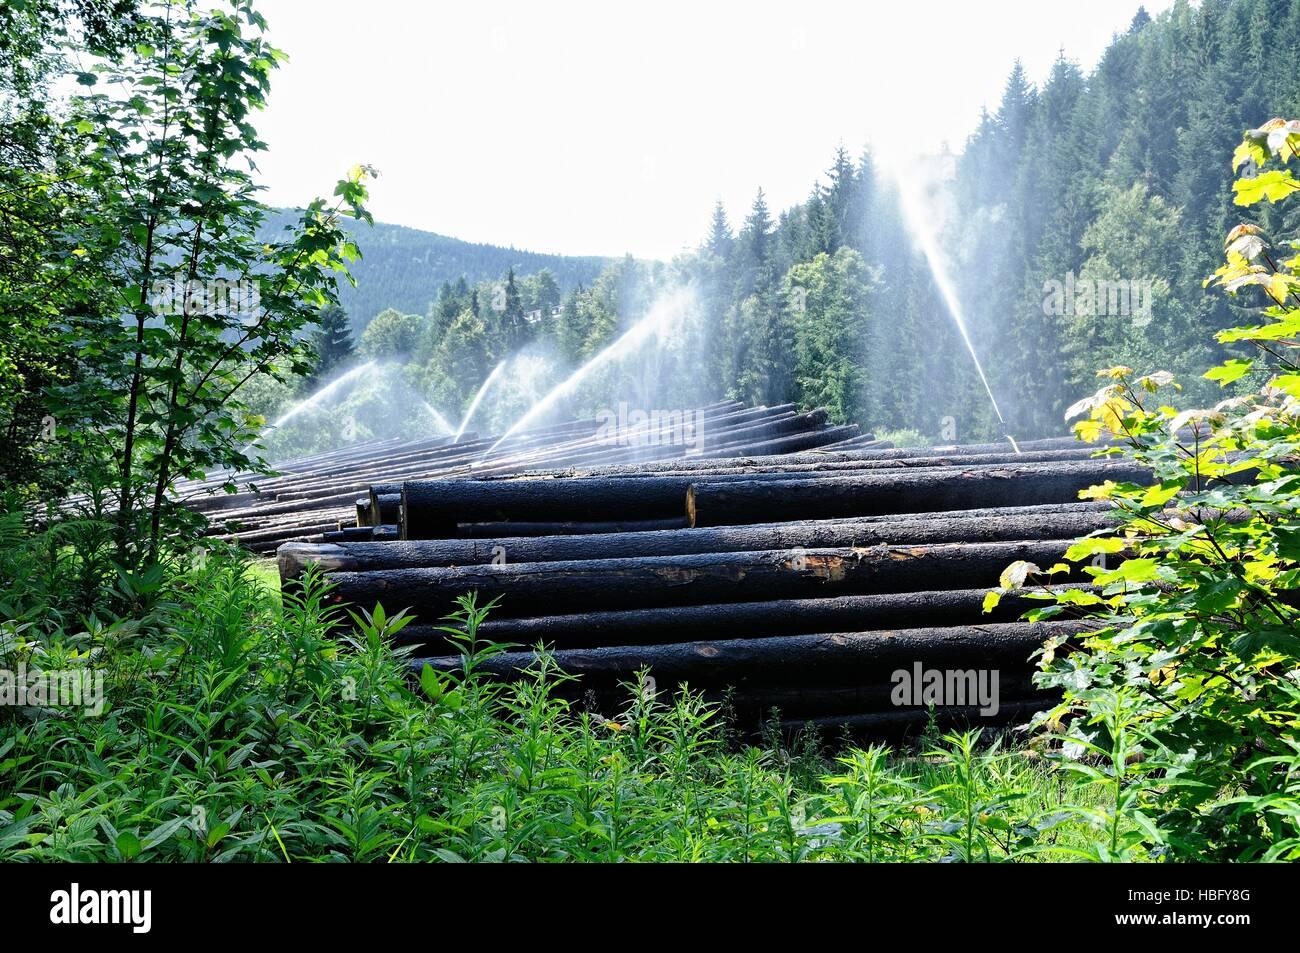 Irrigation of a lumber yard Stock Photo